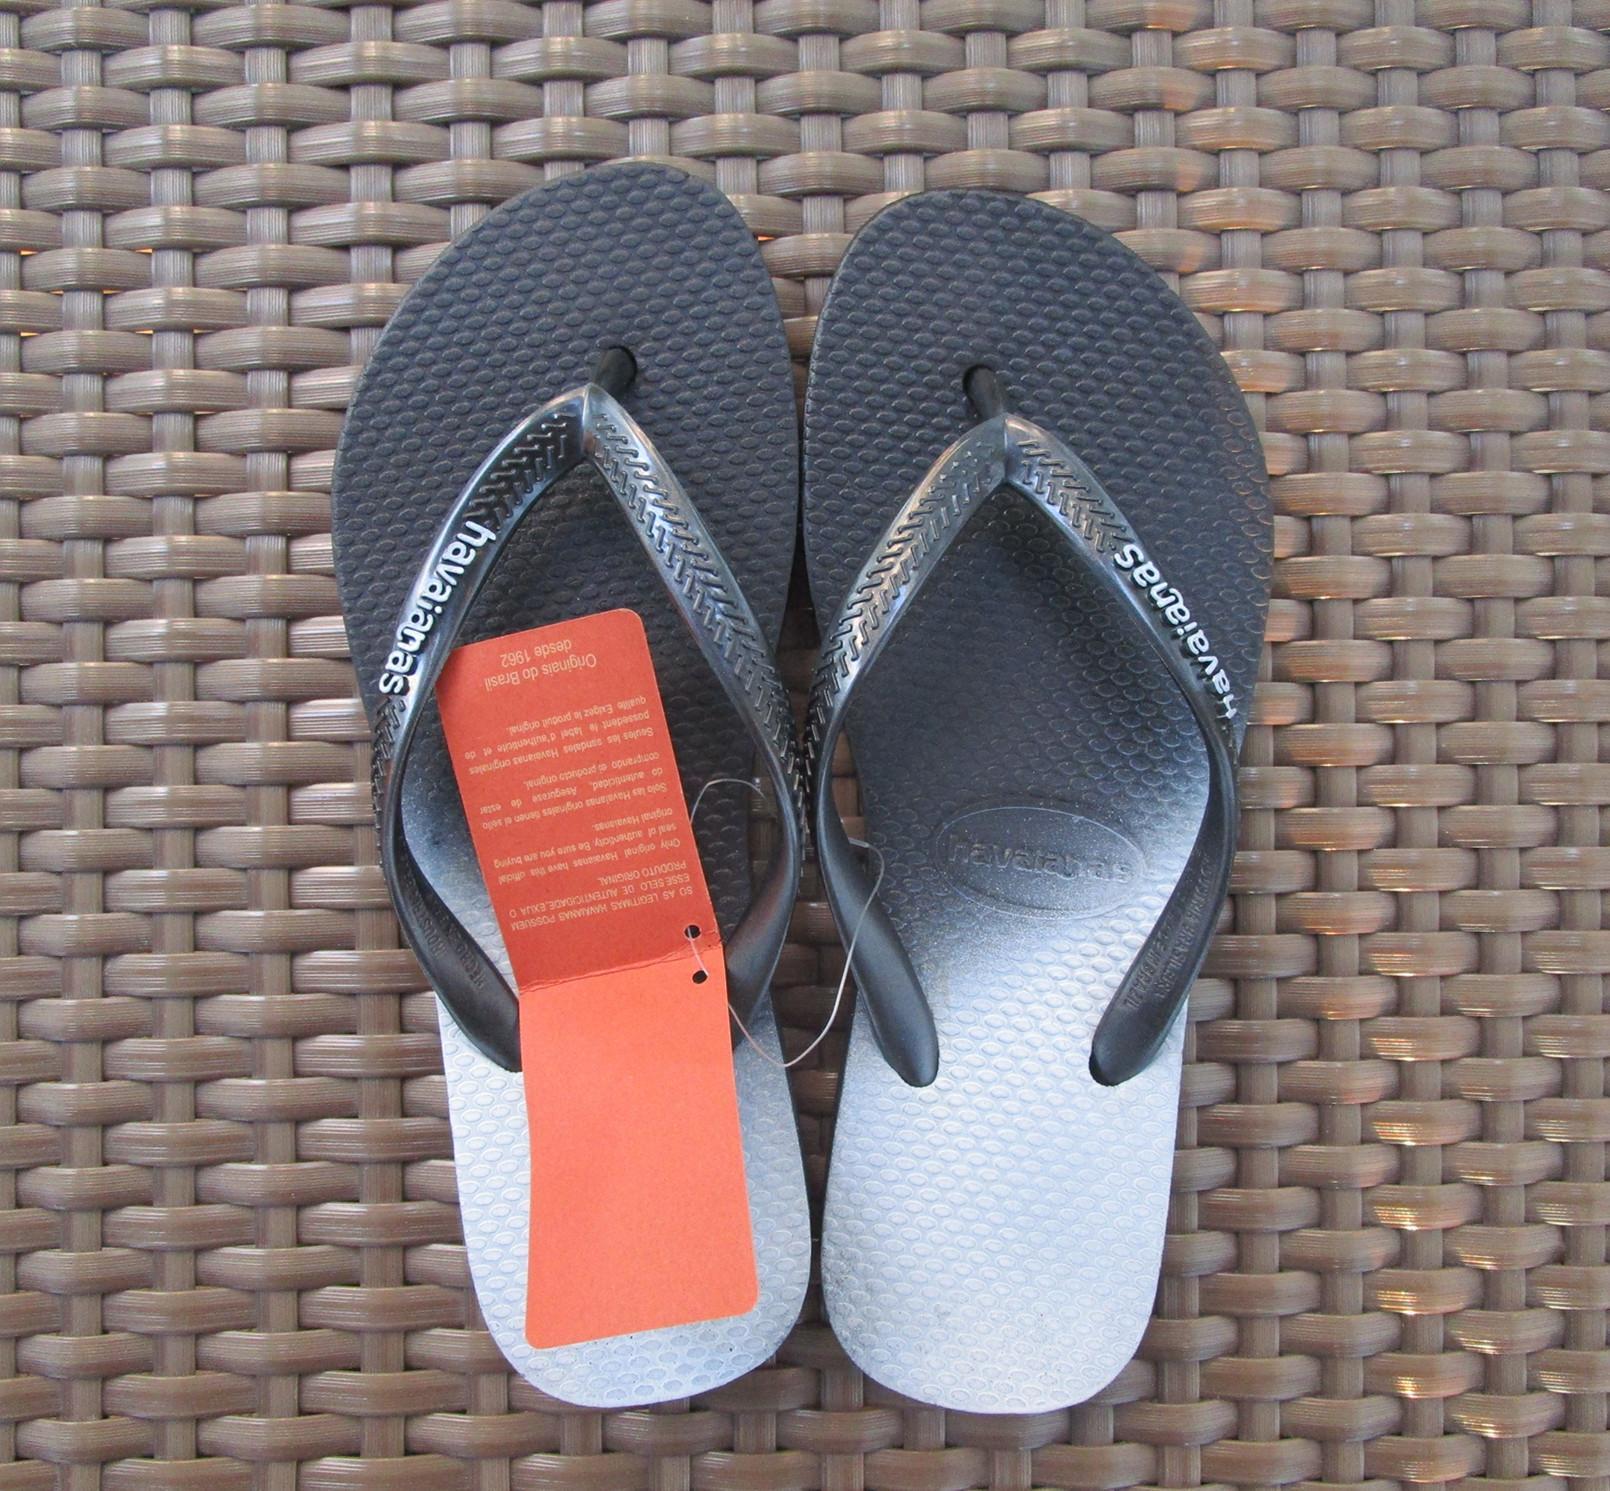 b916f933621e Flip Flops for Women for sale - Womens Flip Flops online brands ...